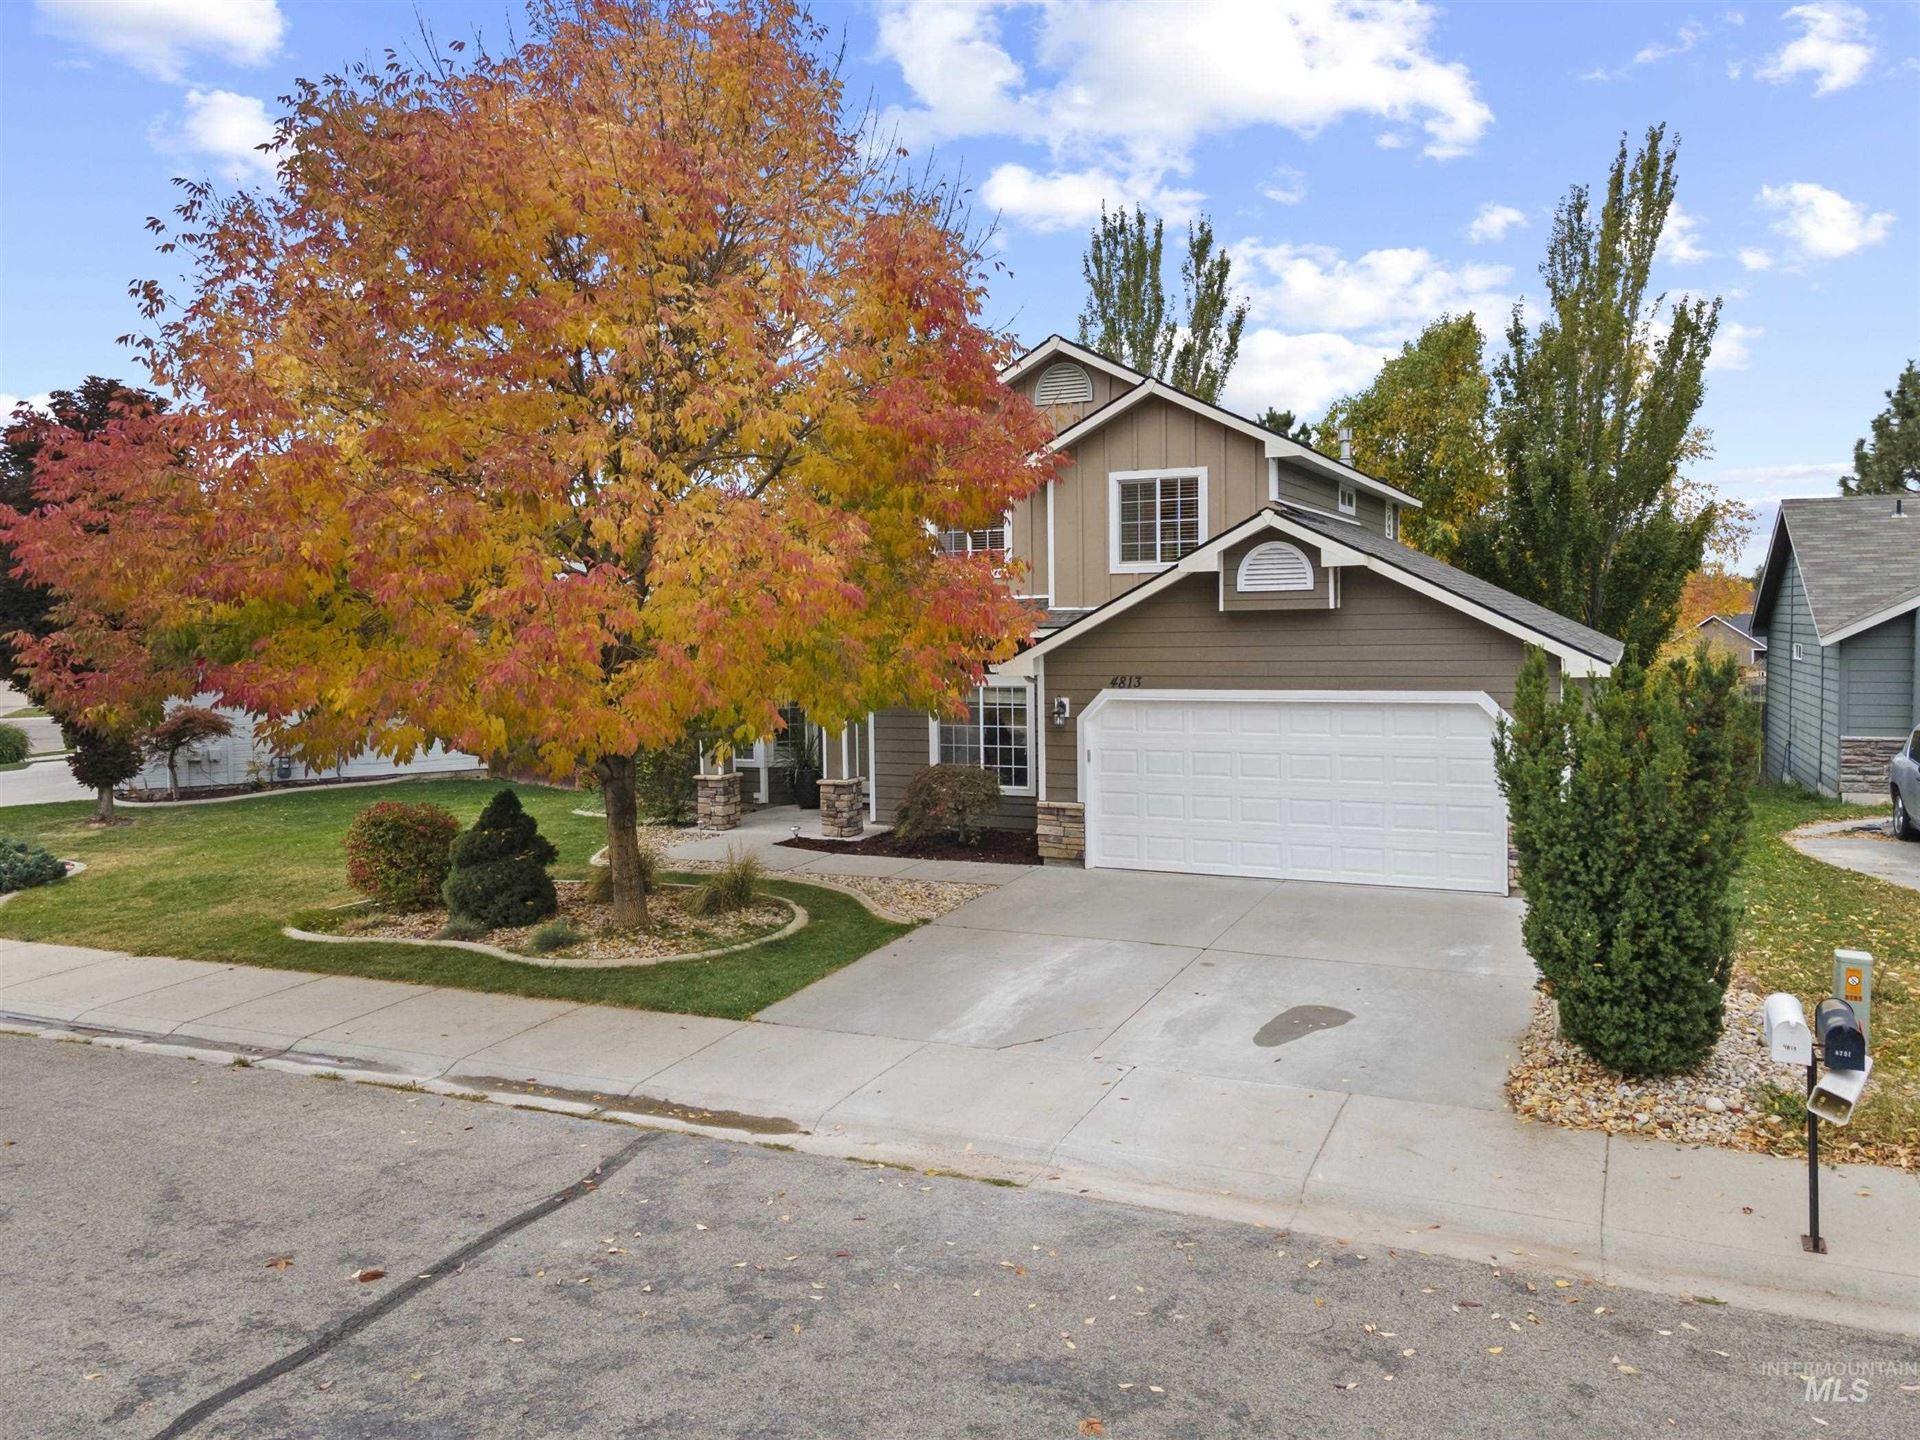 4813 S Whitmore Way #-, Boise, ID 83709 - MLS#: 98821945